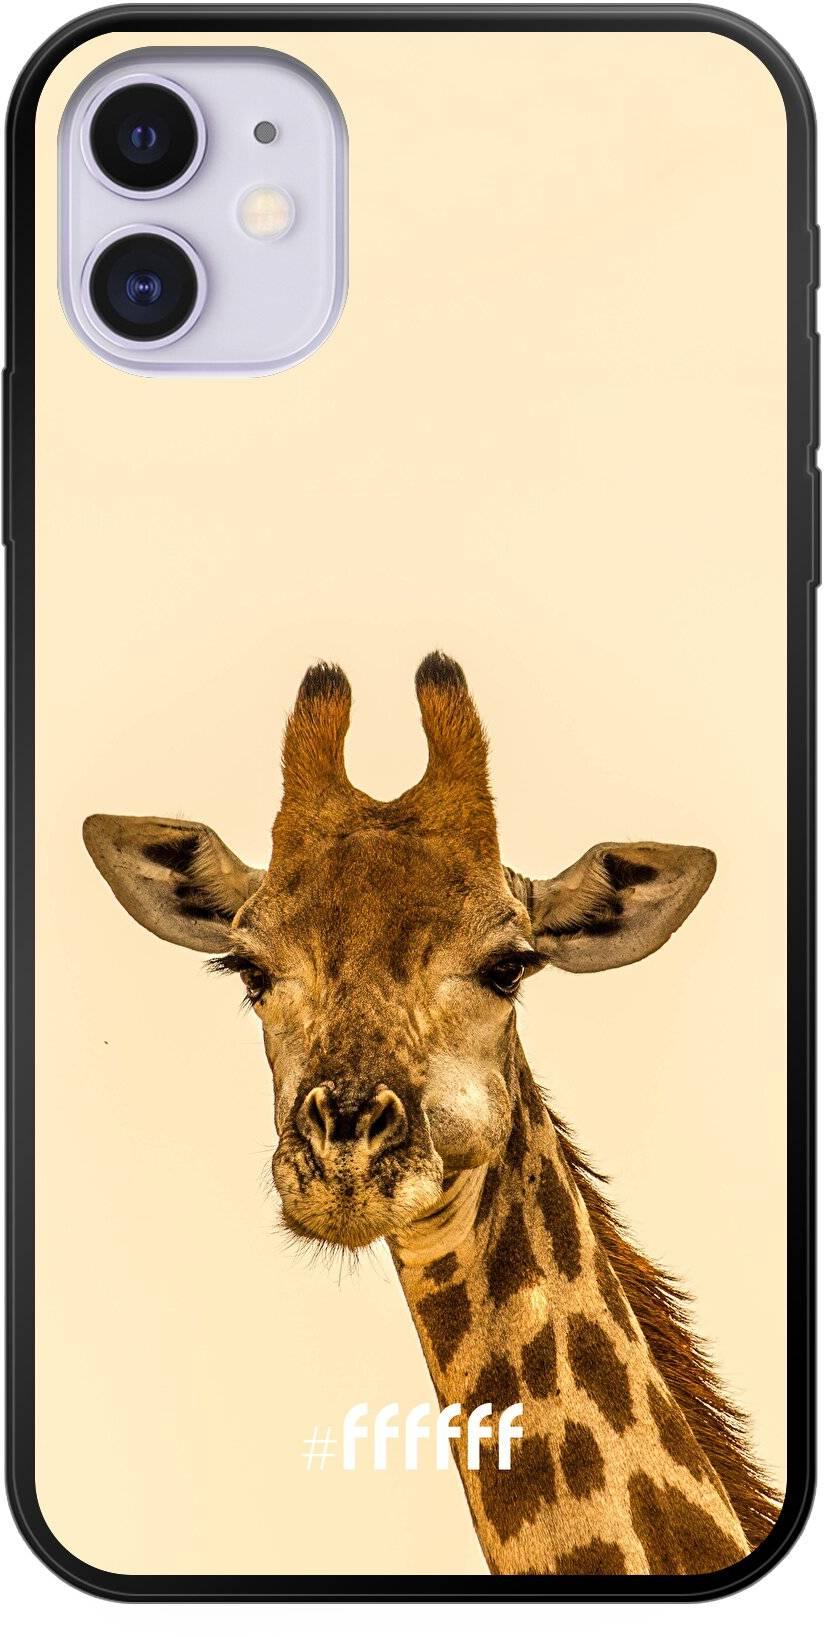 Giraffe iPhone 11